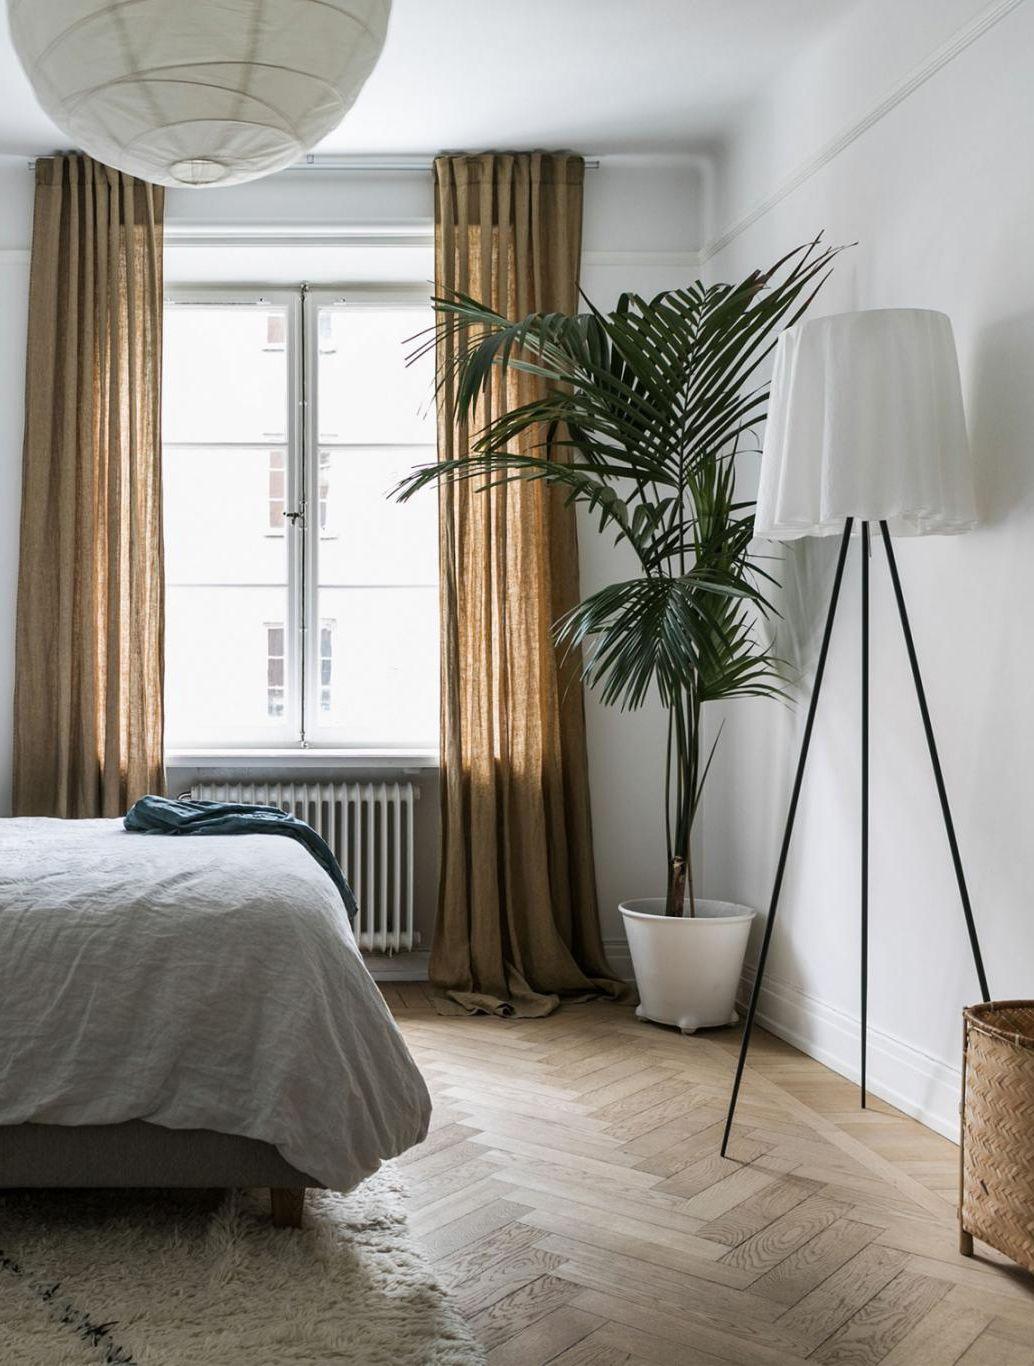 Loft bedroom privacy  bedroom  bedrooms  Pinterest  Colour Pop and Flooring